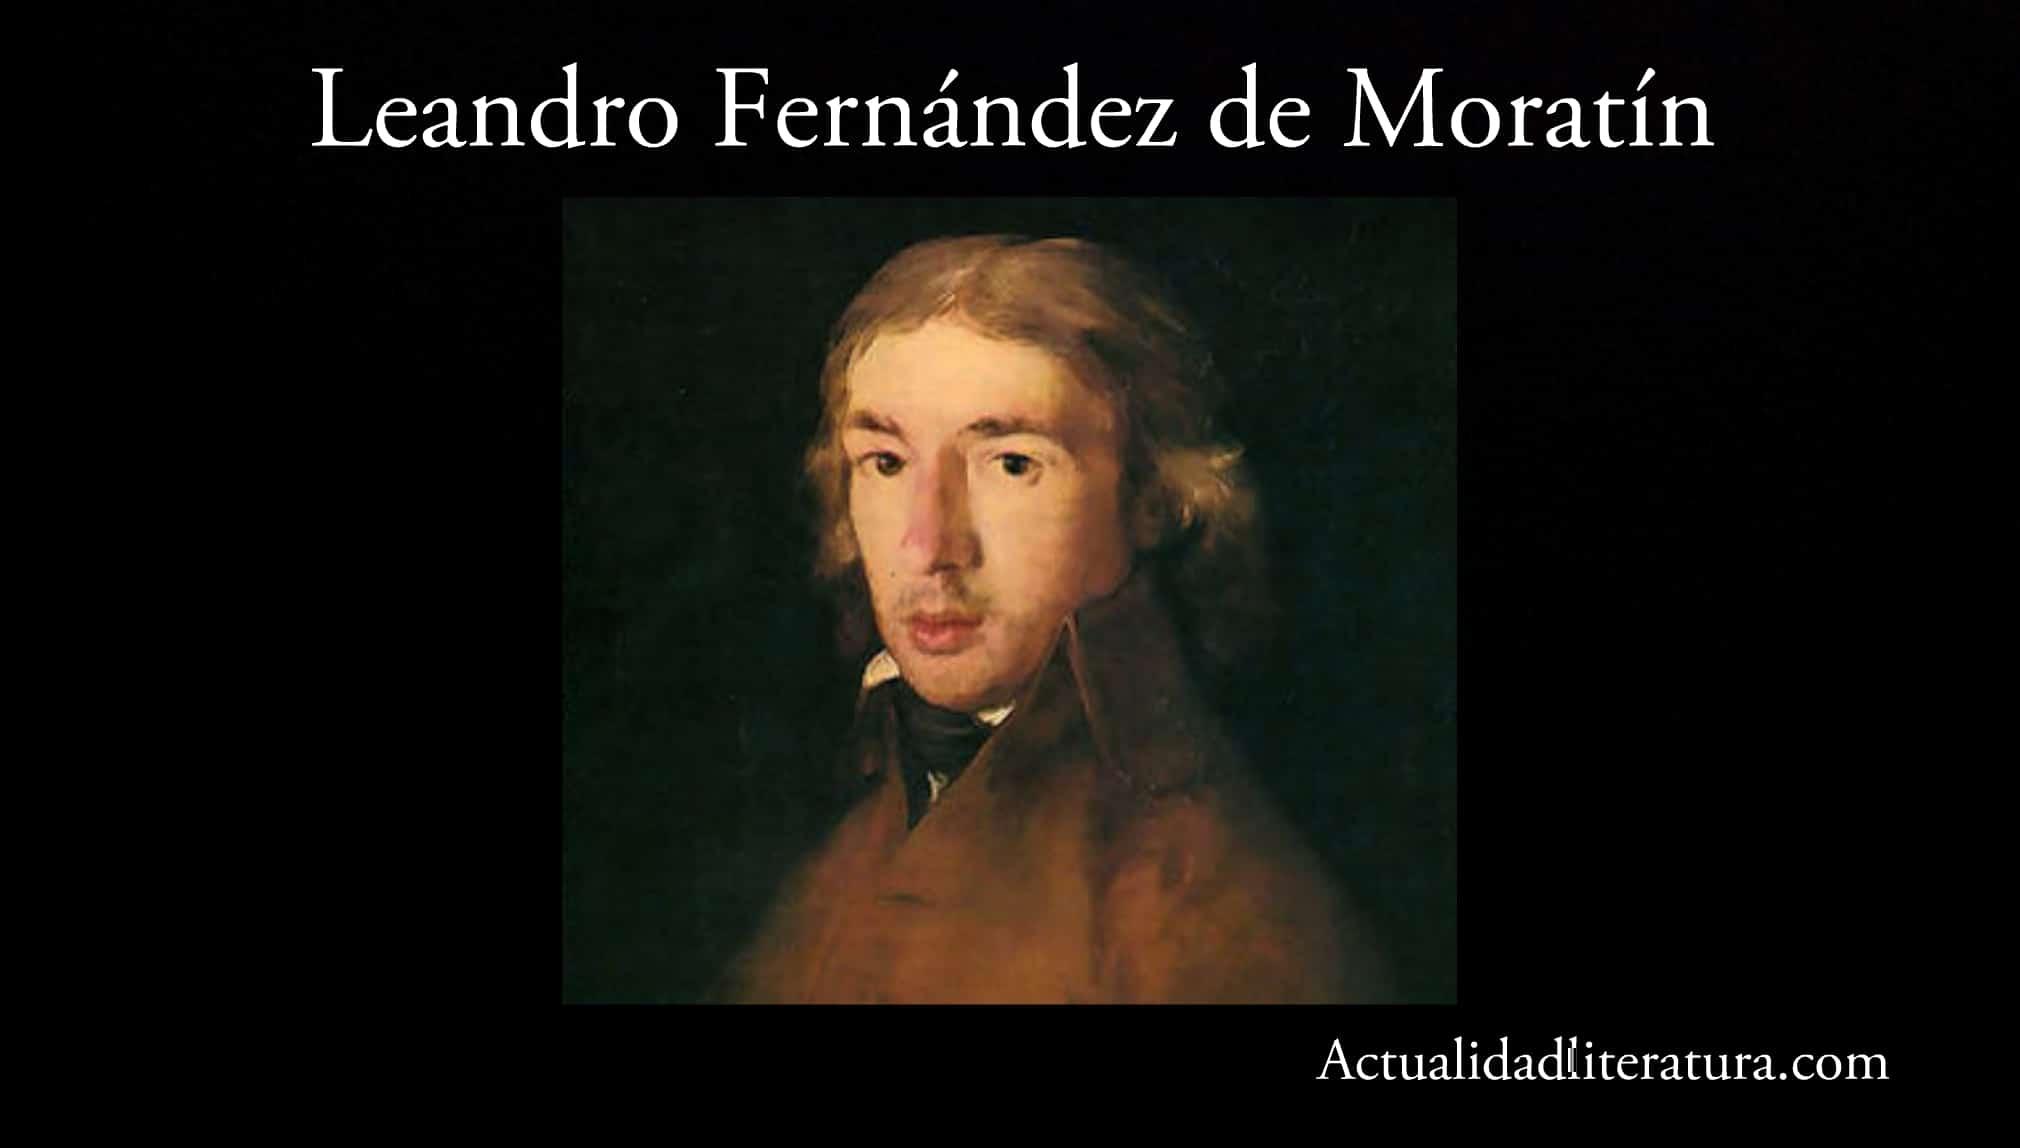 Leandro Fernández de Moratín.